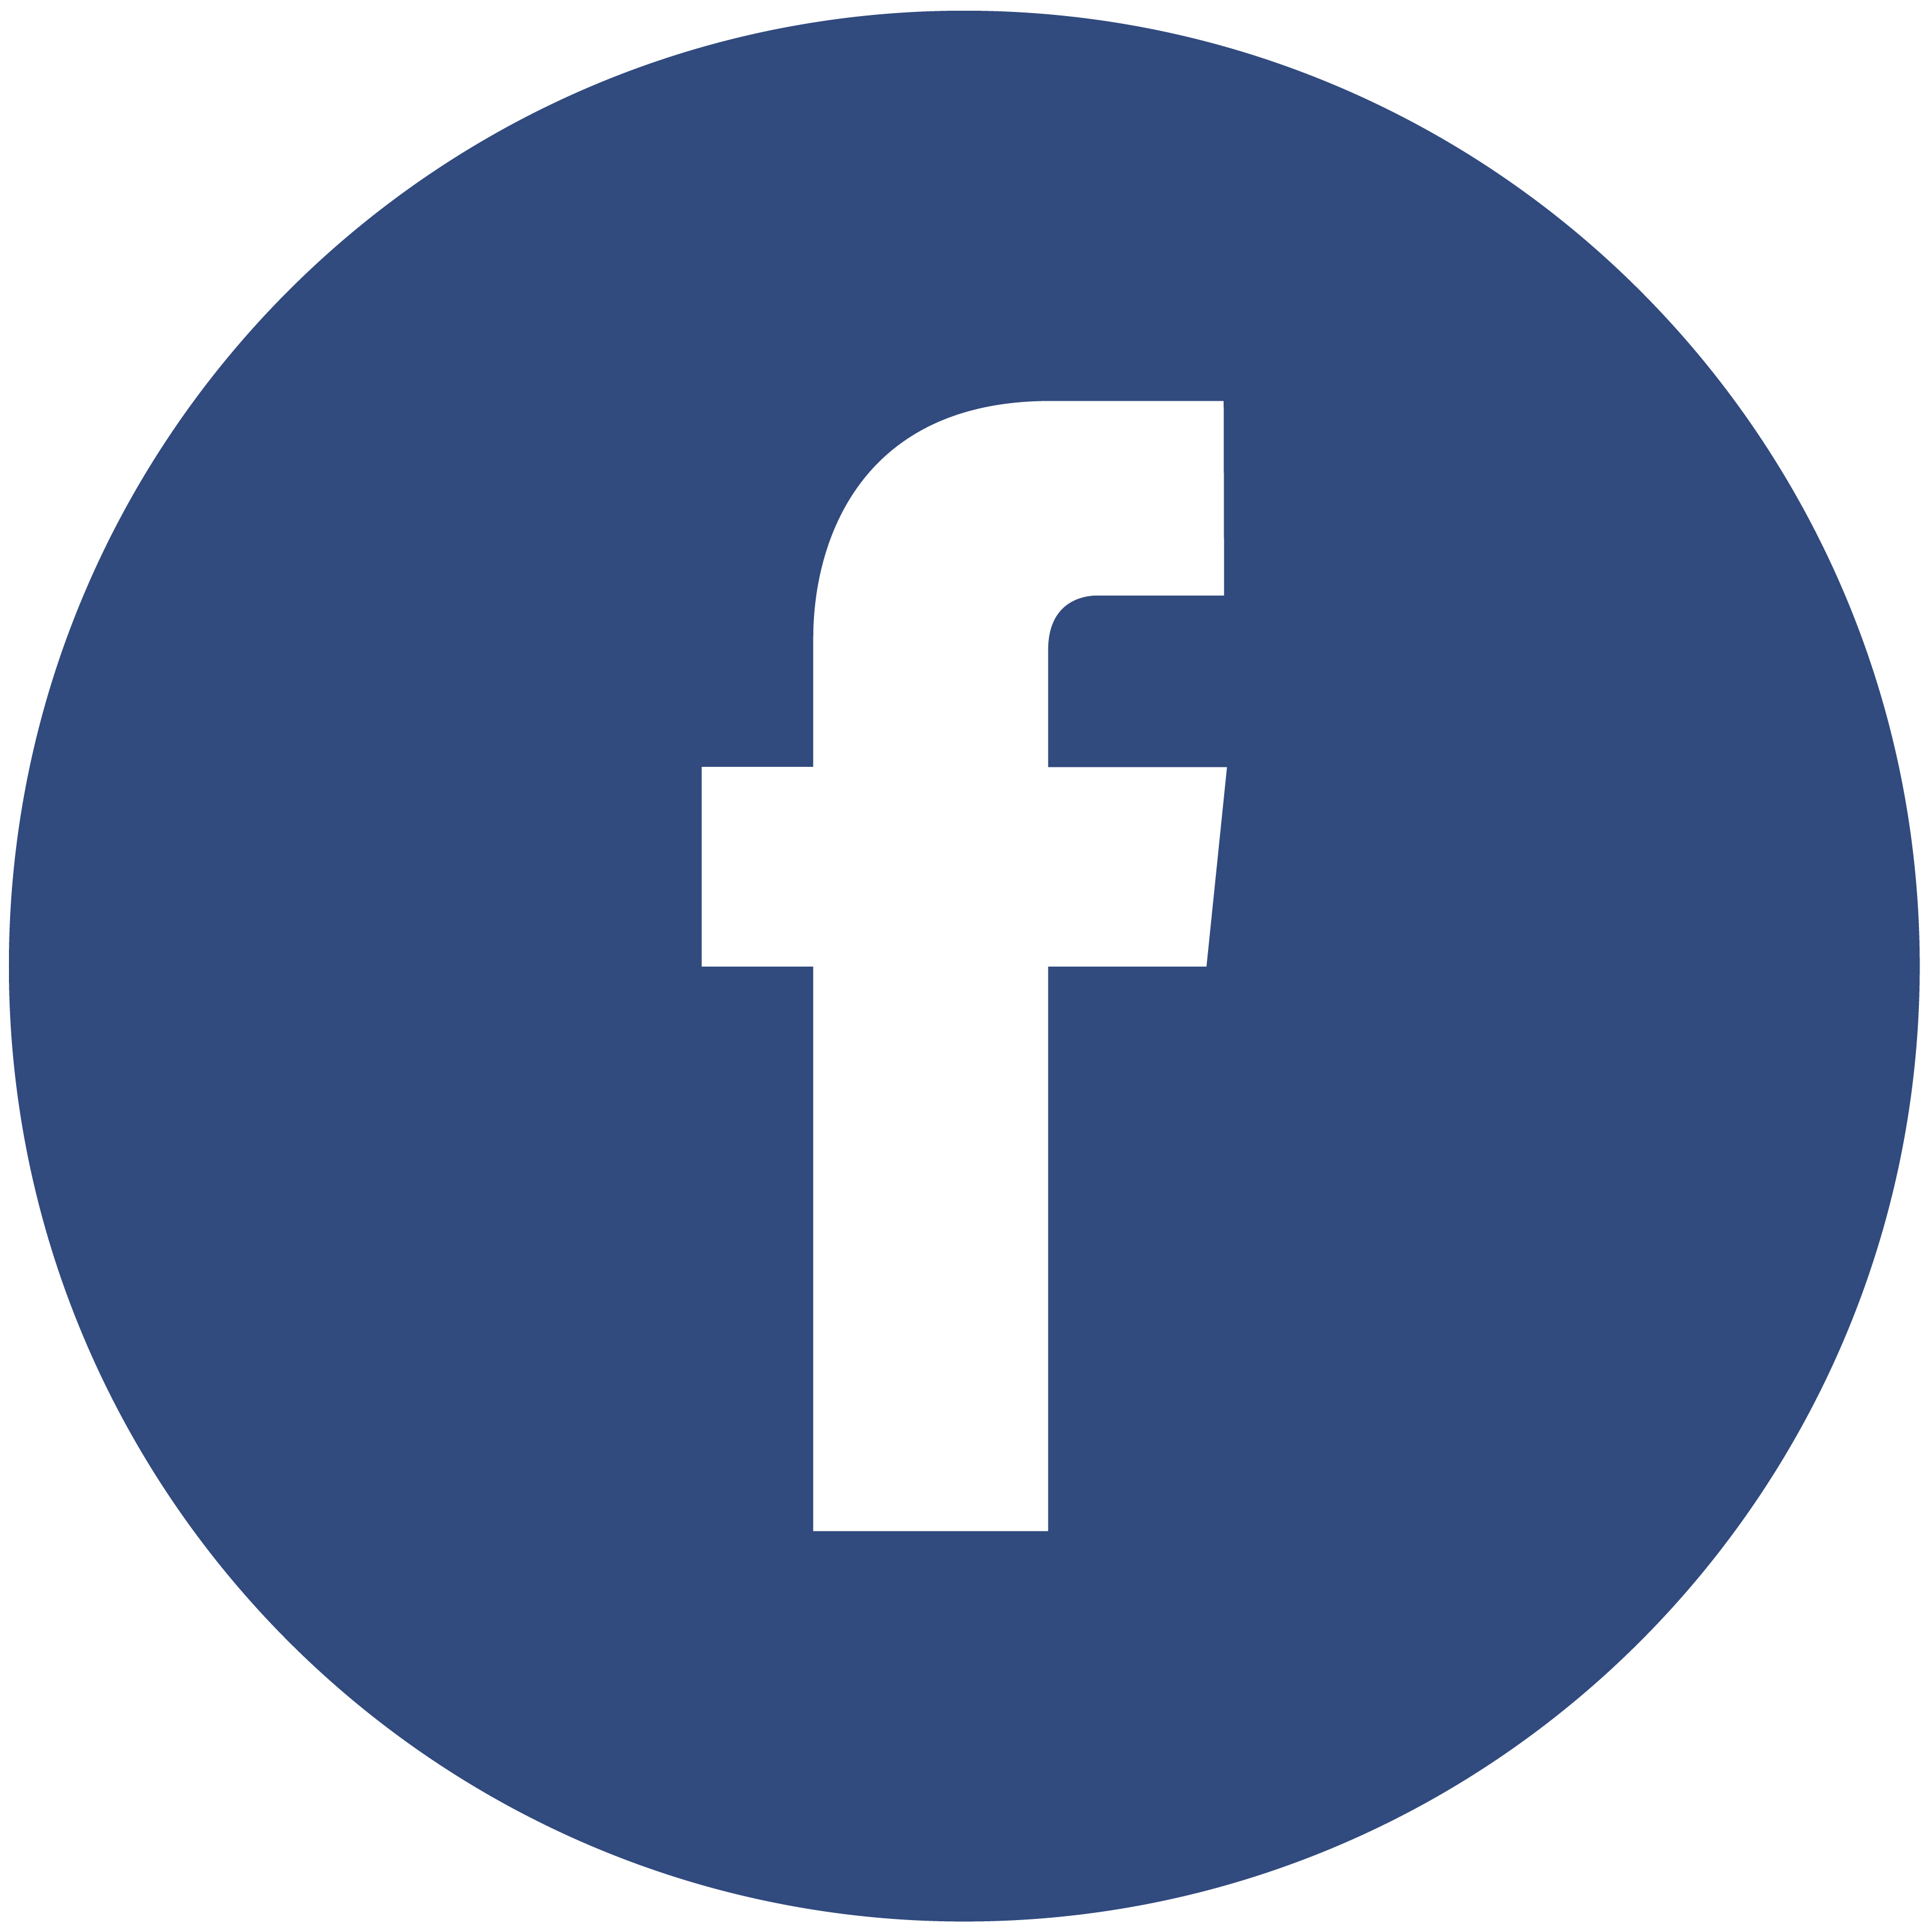 Facebook celebrity clipart png free download Facebook Like Clipart   Free download best Facebook Like Clipart on ... png free download